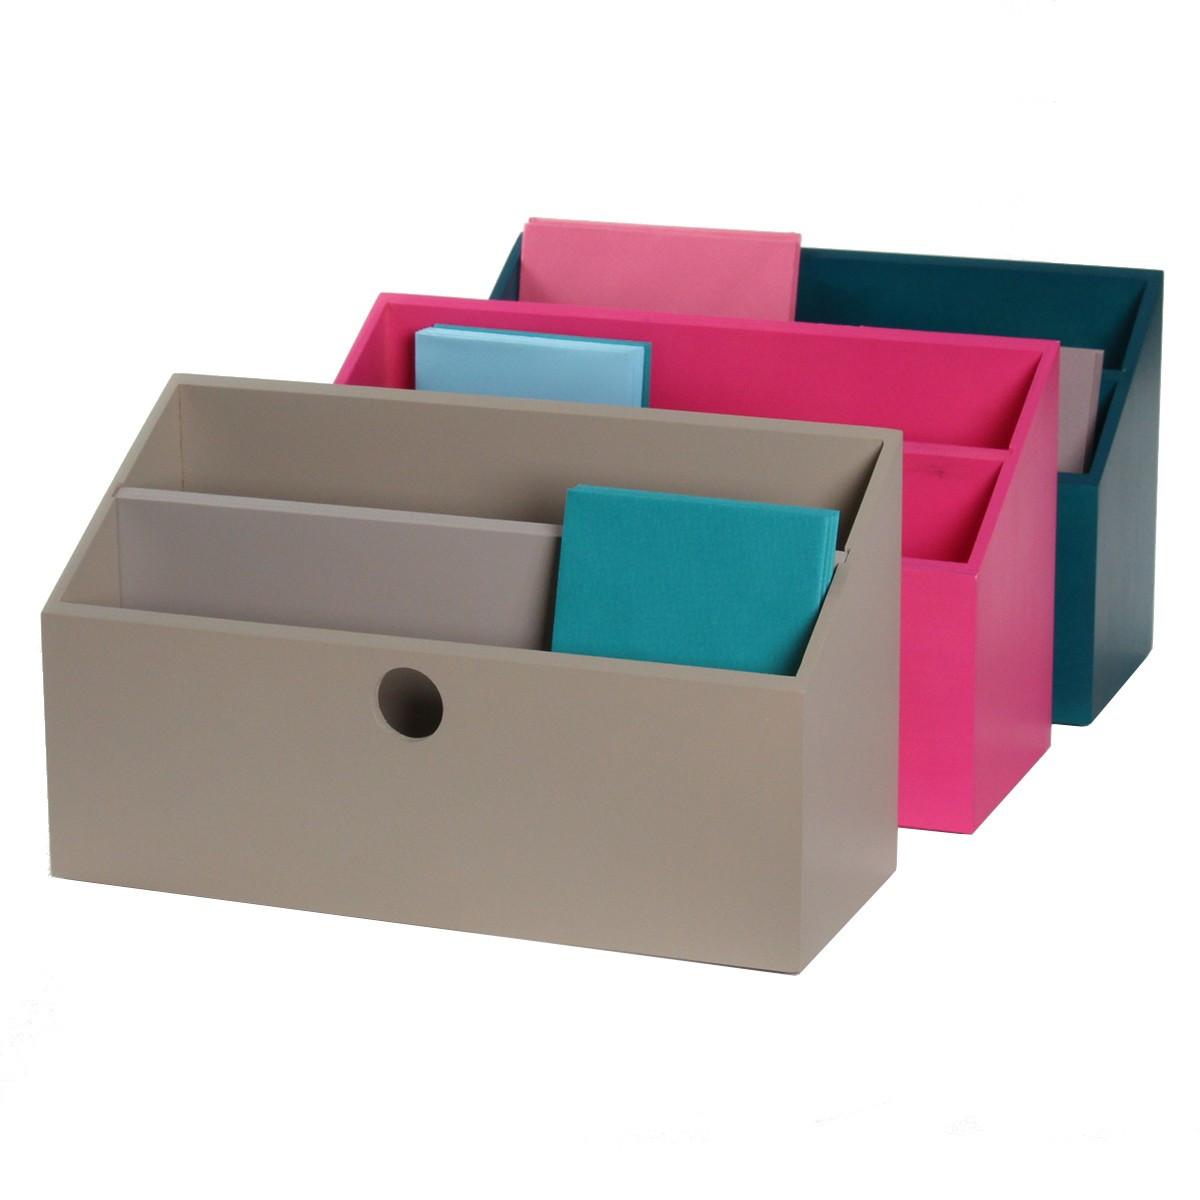 porte lettres bois fuchsia rangement courrier. Black Bedroom Furniture Sets. Home Design Ideas